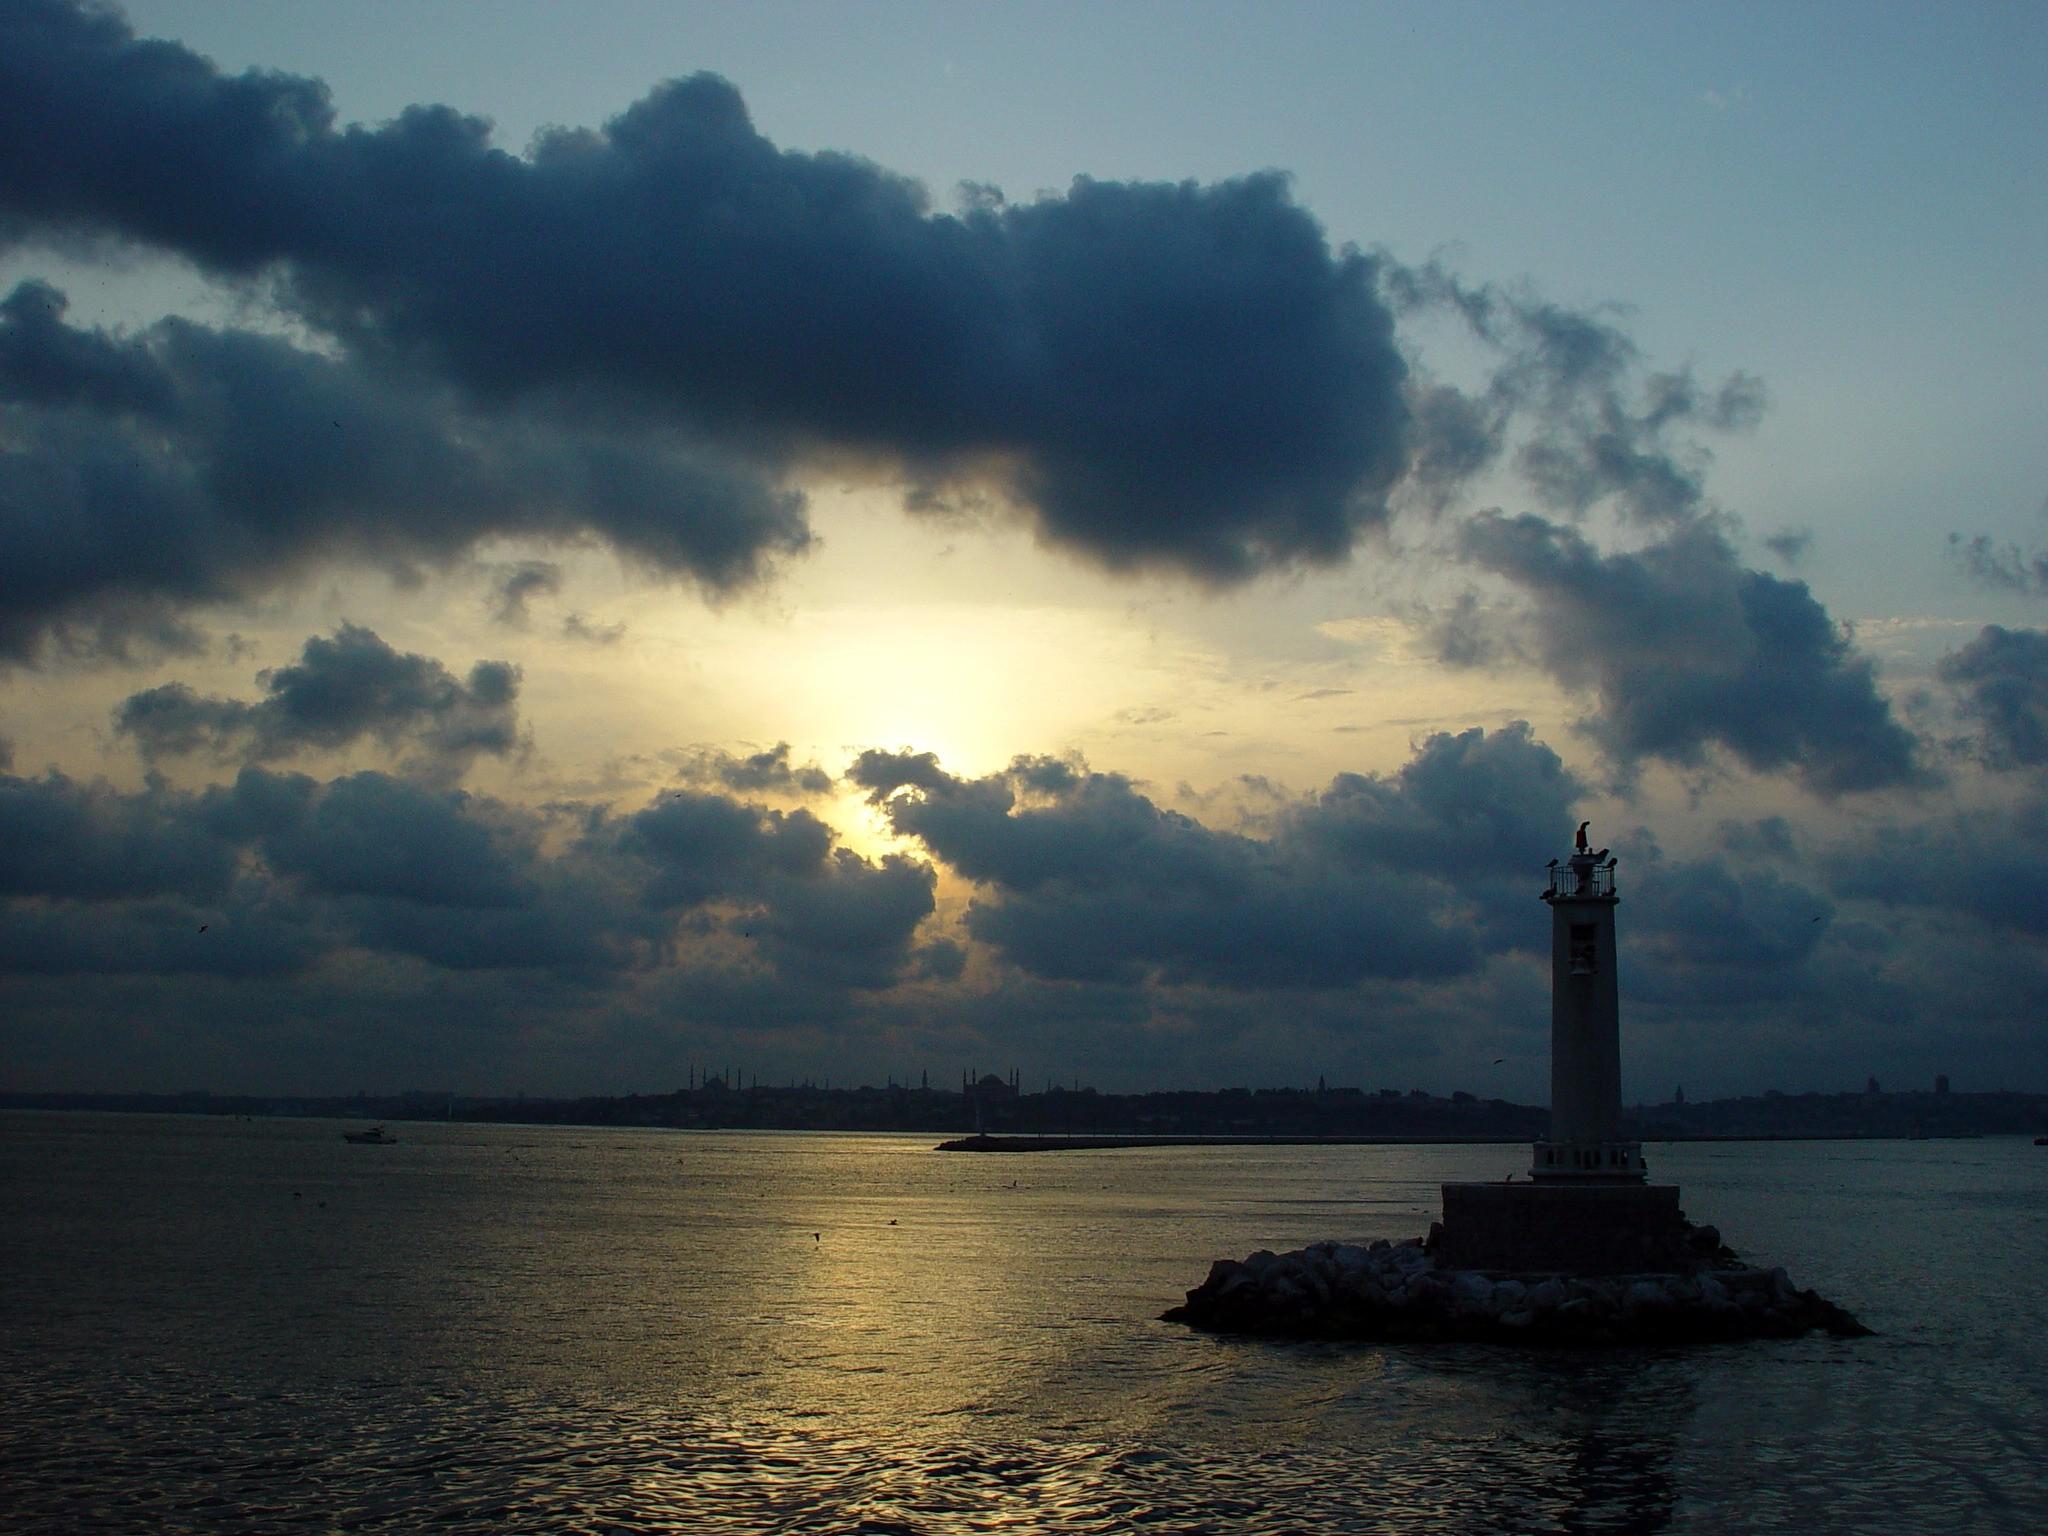 Lighthouses Turkey Wallpaper 2048x1536 Lighthouses Turkey Istanbul 2048x1536